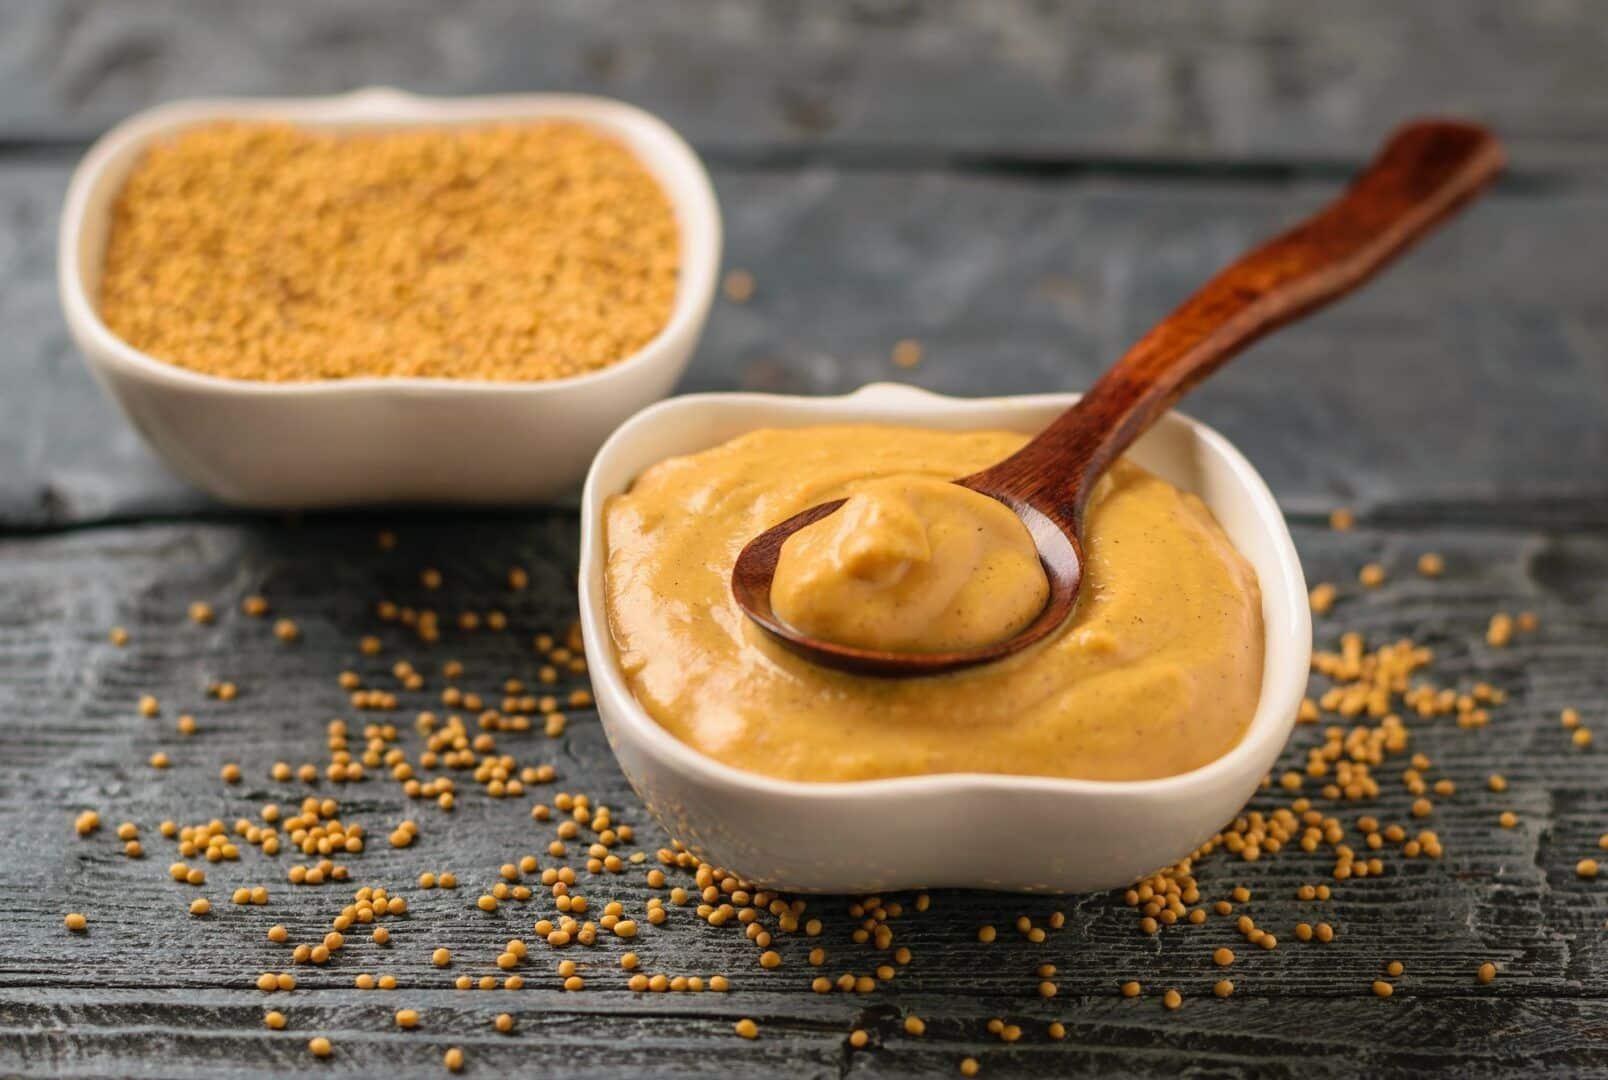 Alimentos amargos - como o corpo humano percebe esse tipo de sabor